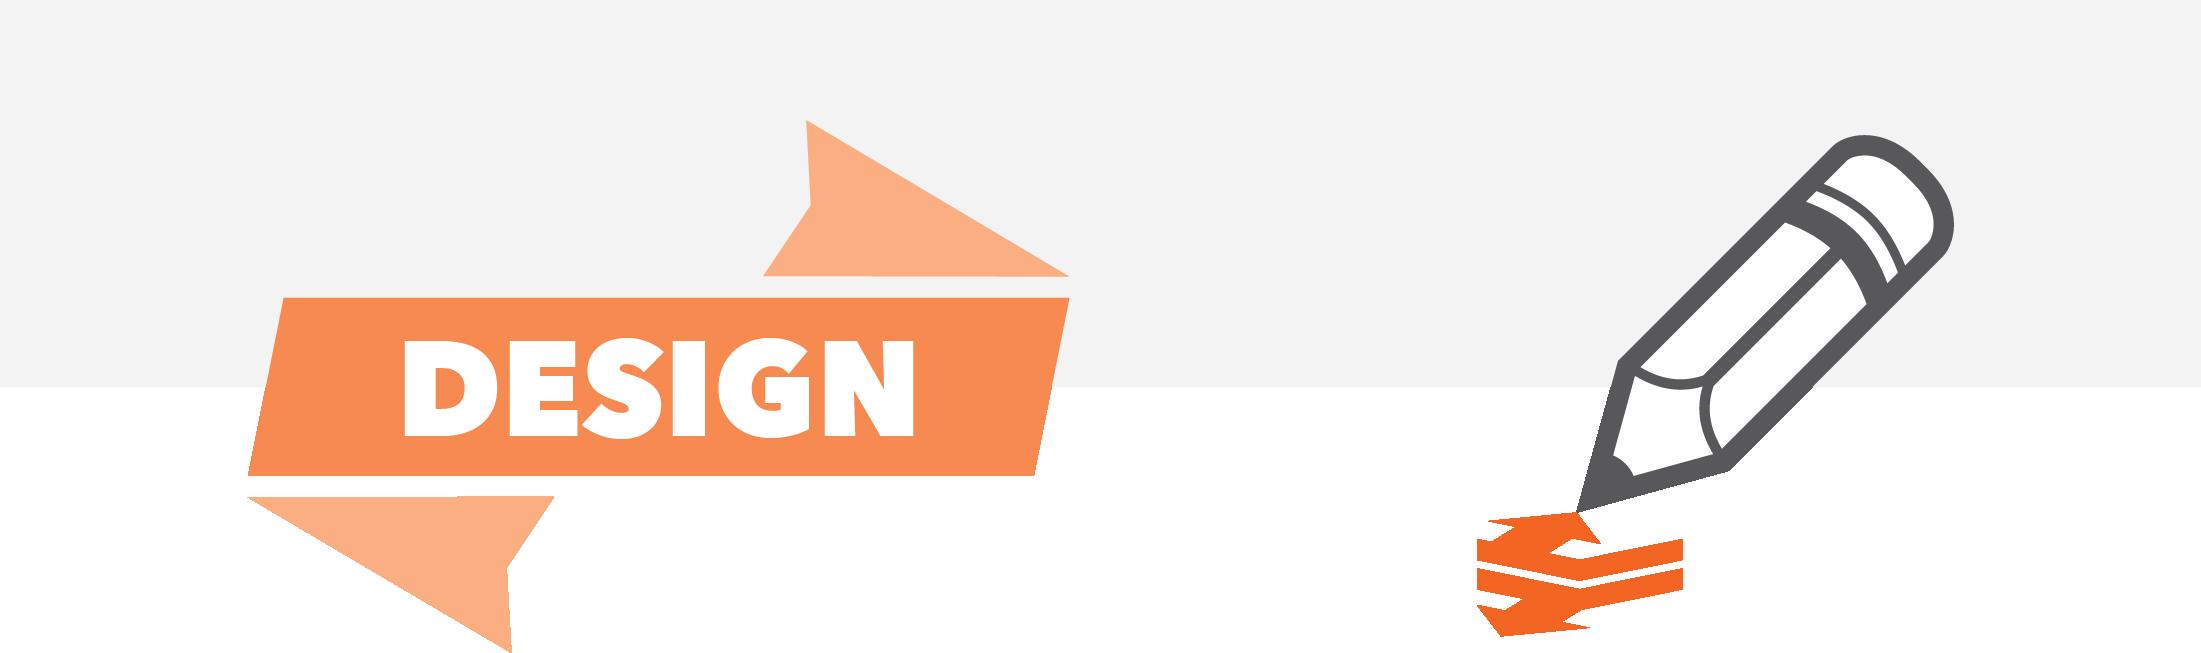 winter-design-image